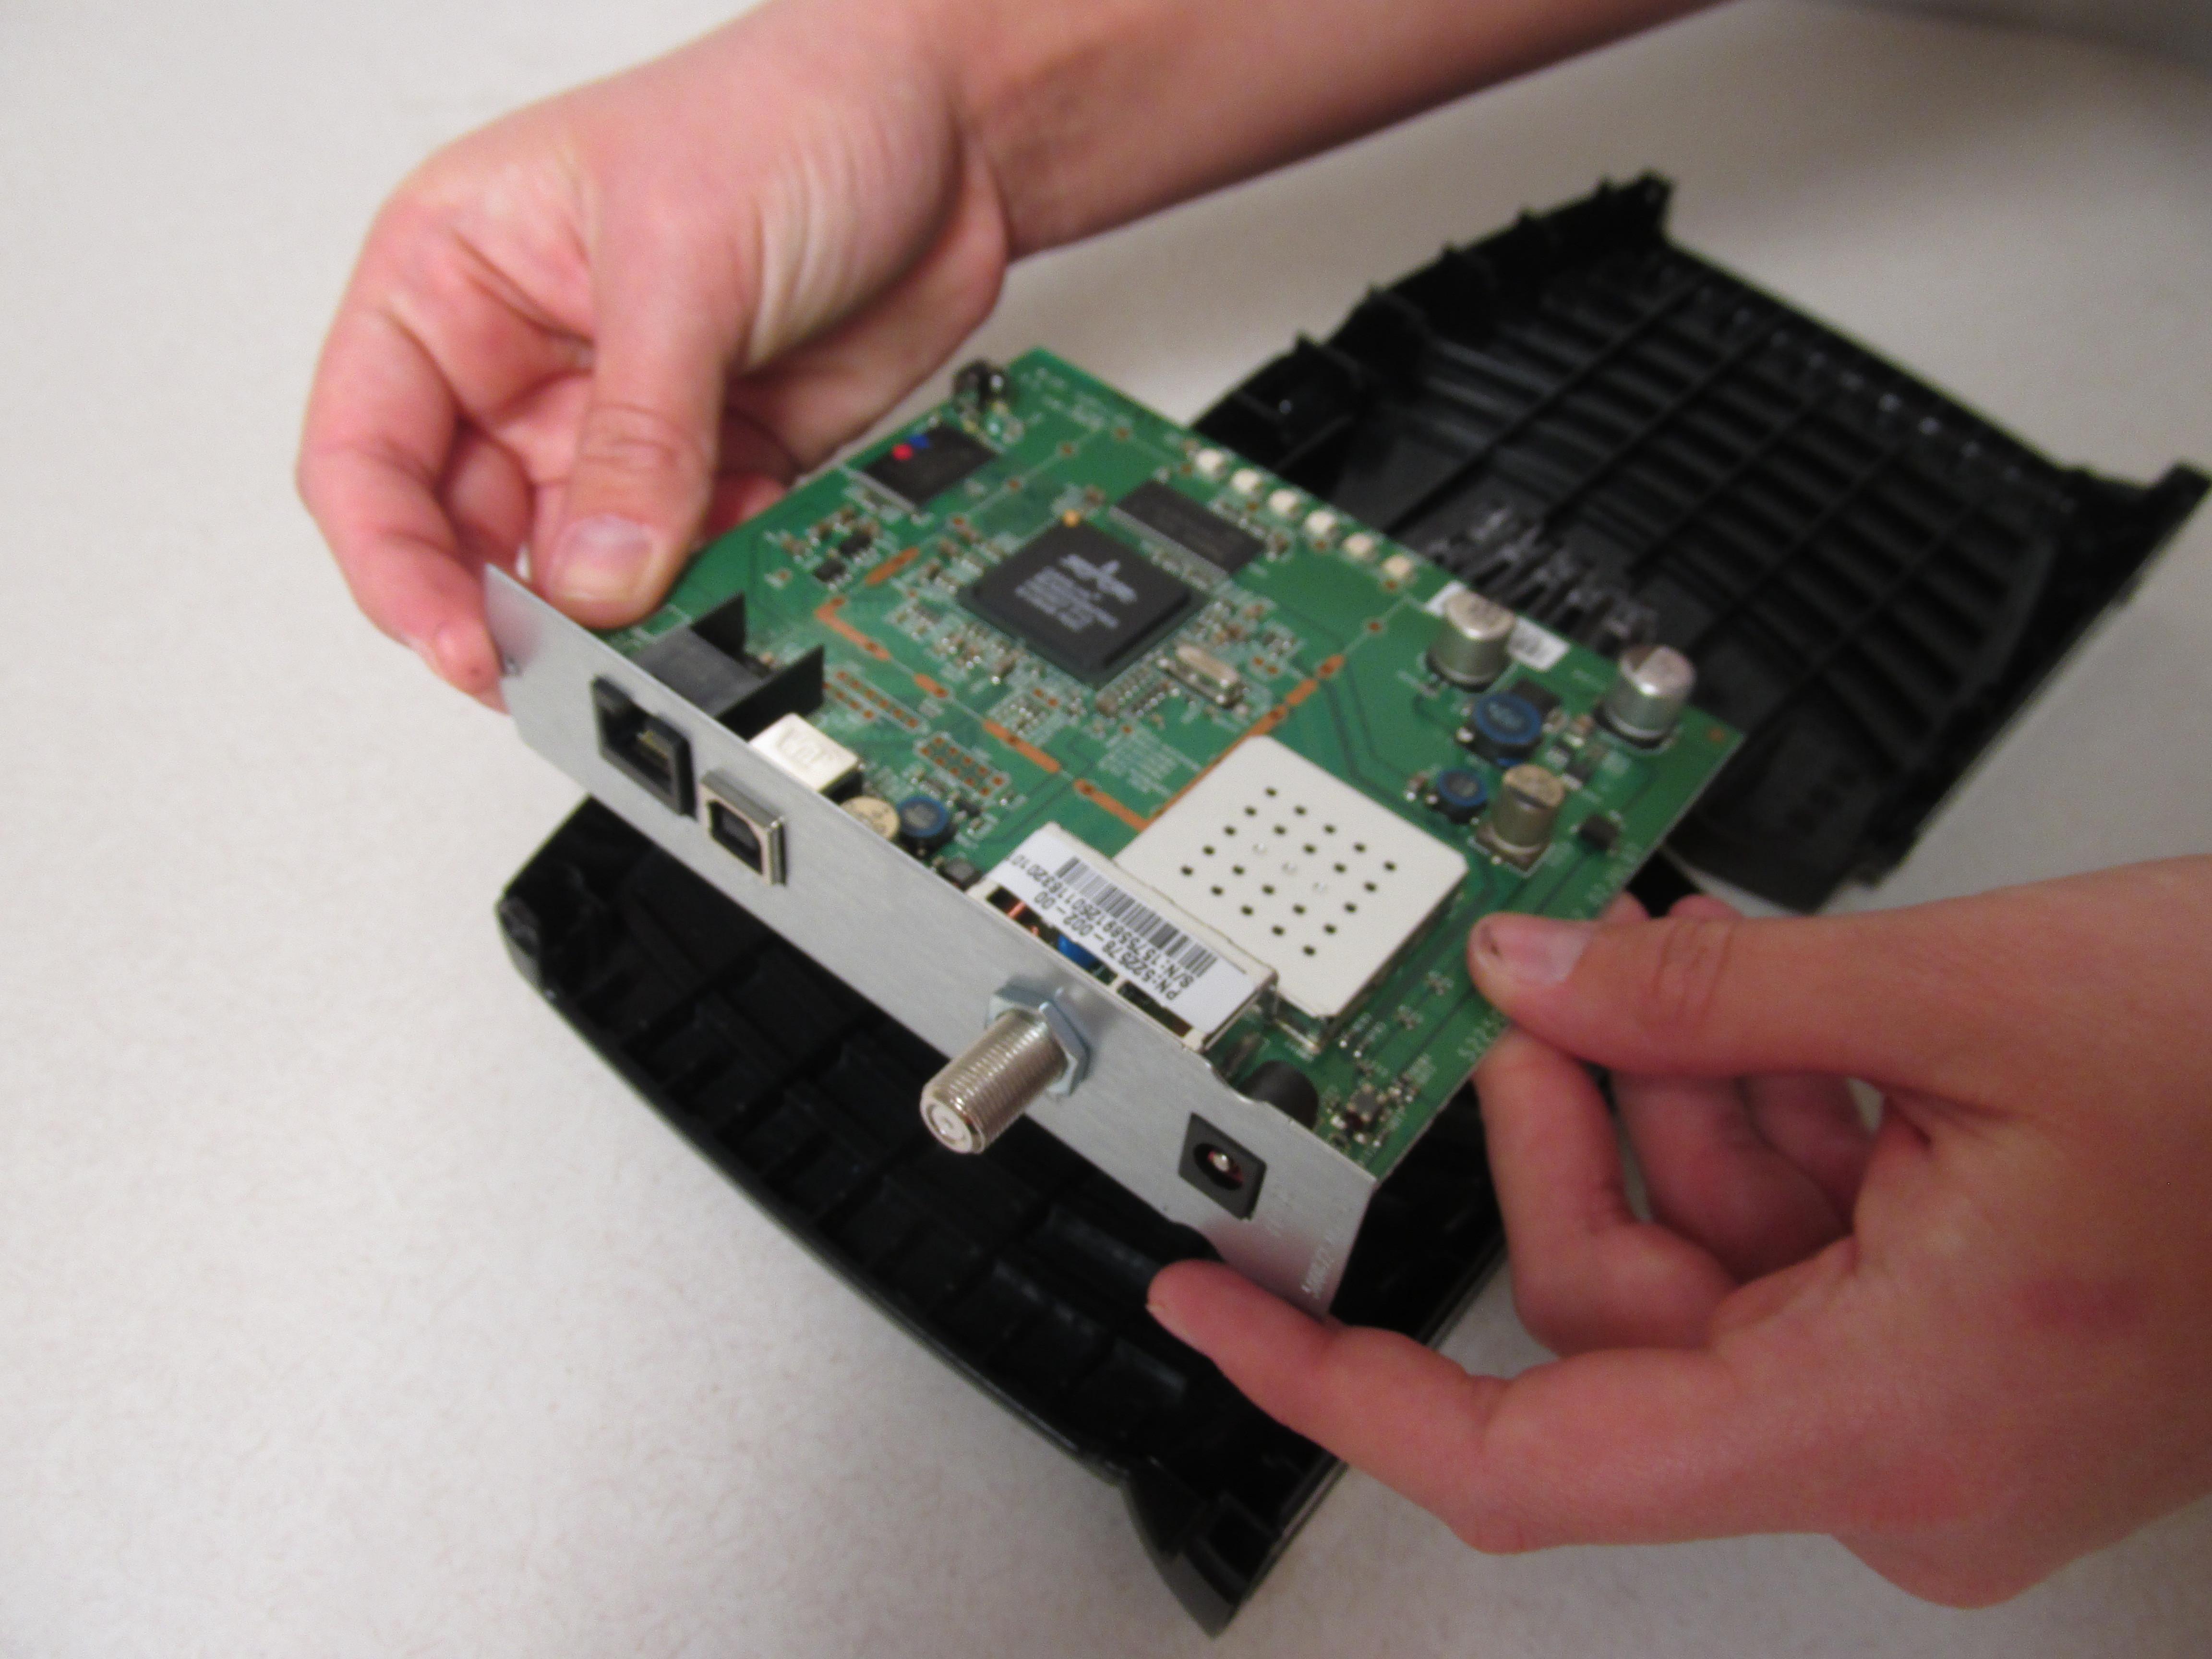 Motorola Surfboard Sb5101 Motherboard Replacement Ifixit